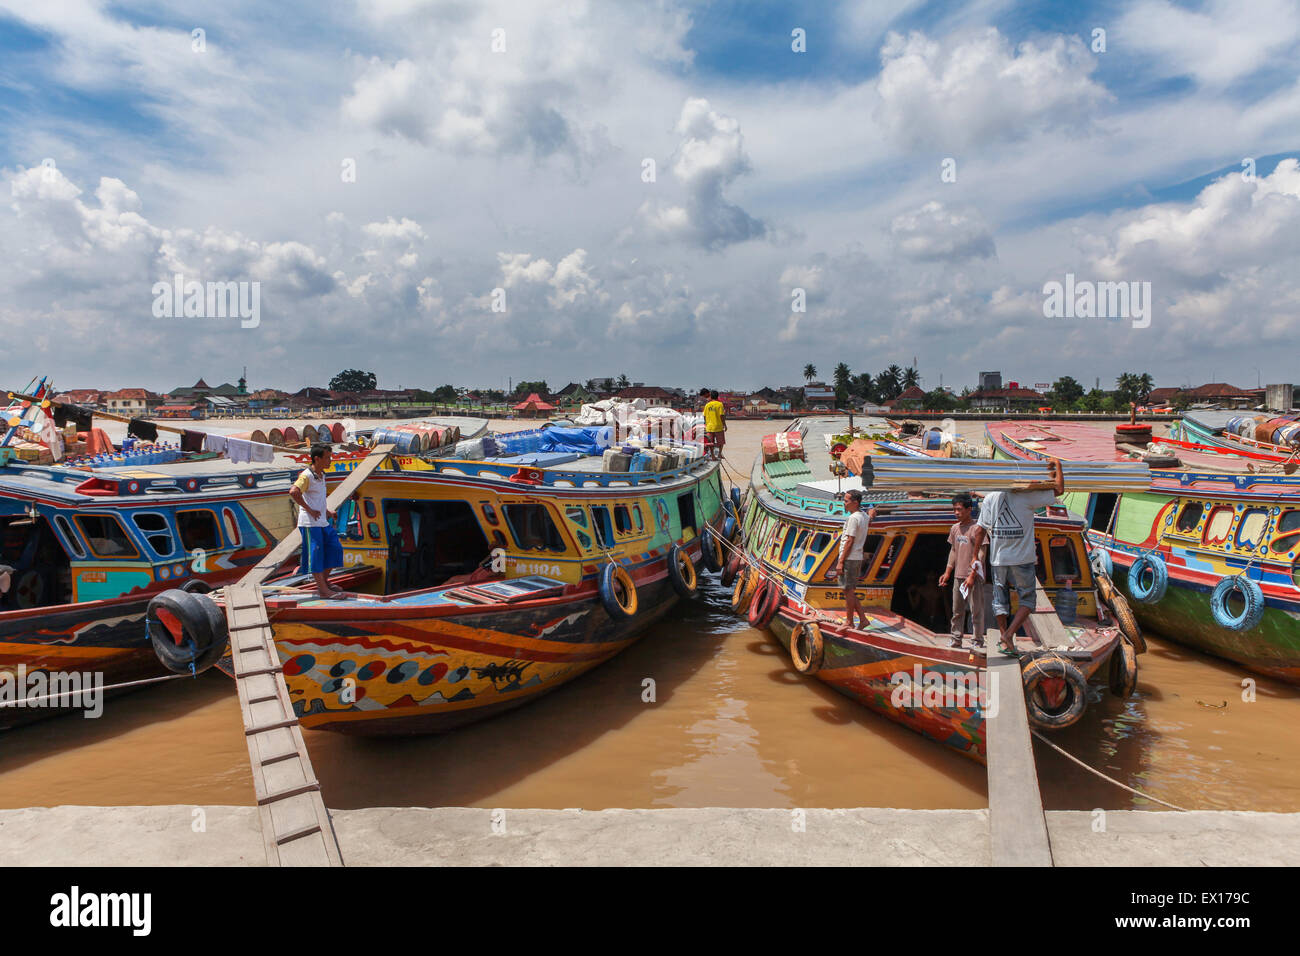 Wooden cargo and passenger boats on Musi River, Sumatra, Indonesia. © Reynold Sumayku - Stock Image